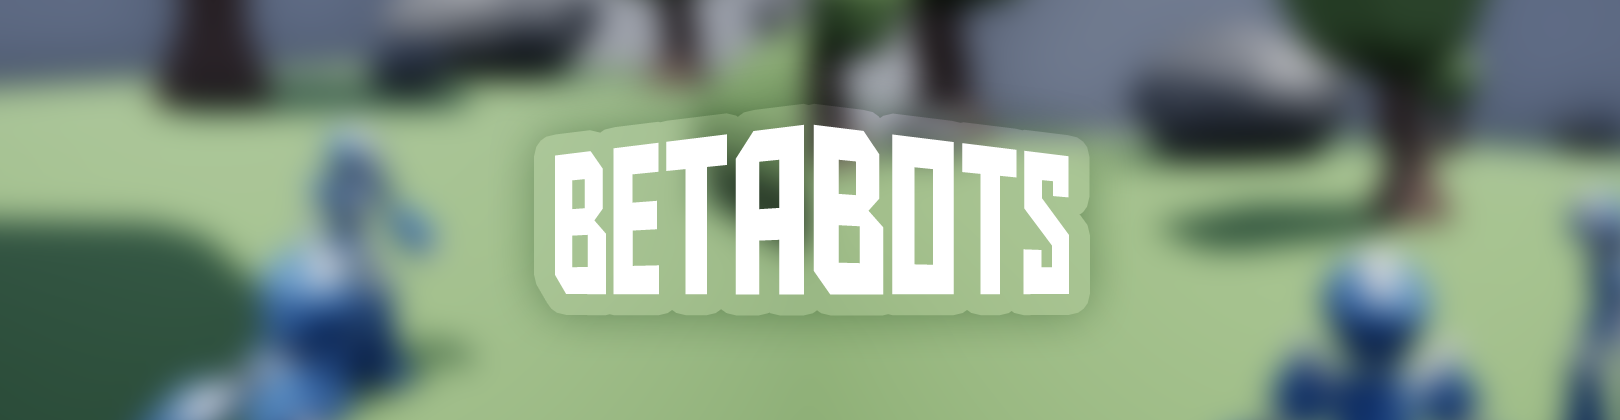 BetaBots